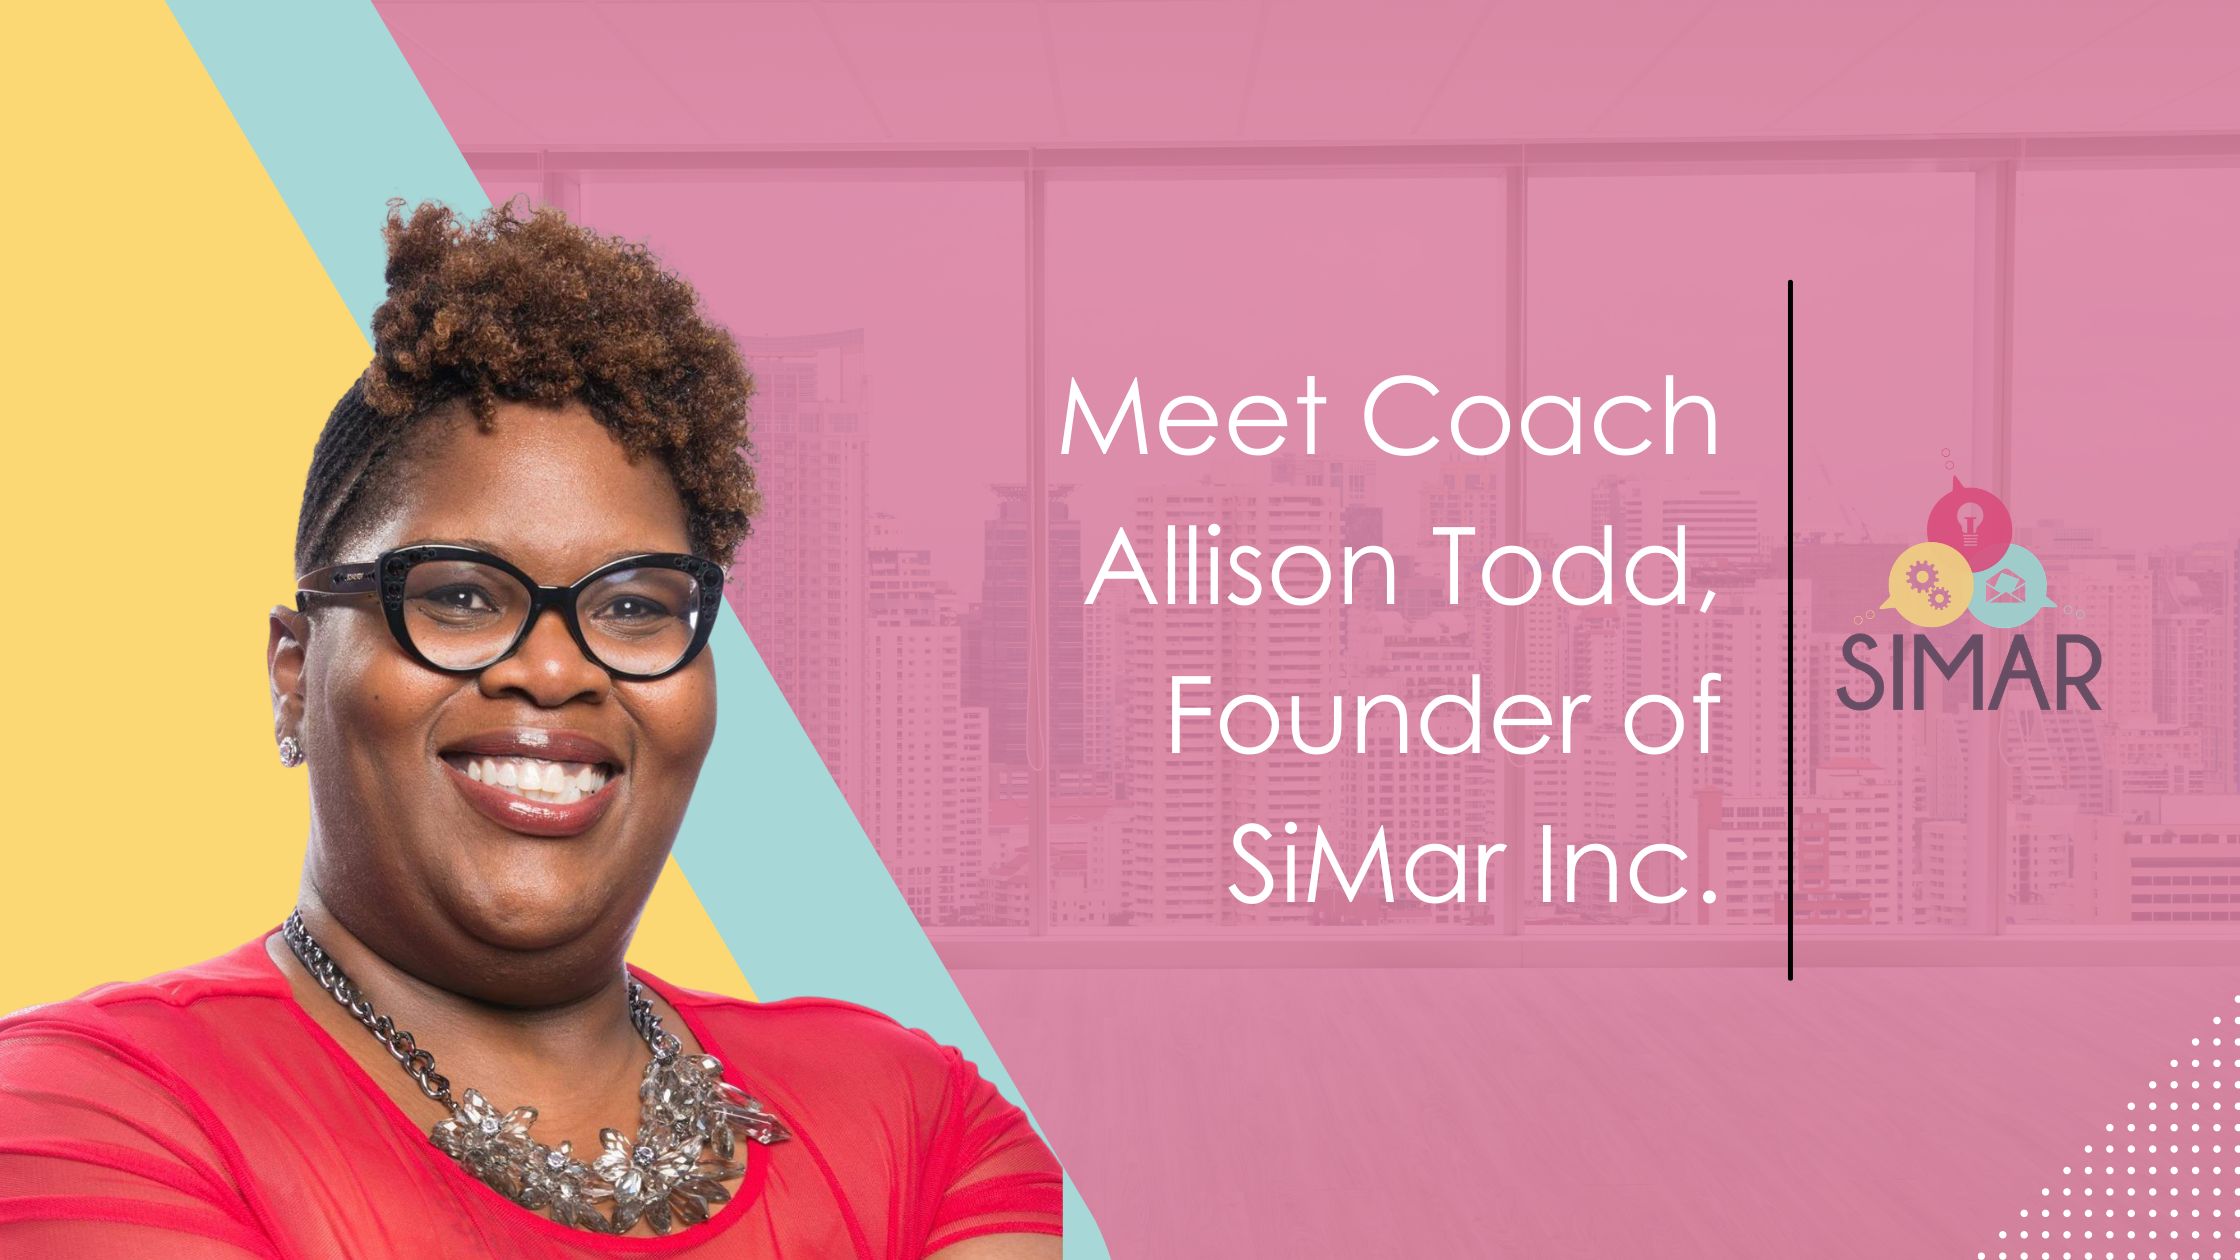 Meet Coach Allison Todd, Founder of SiMar Inc.